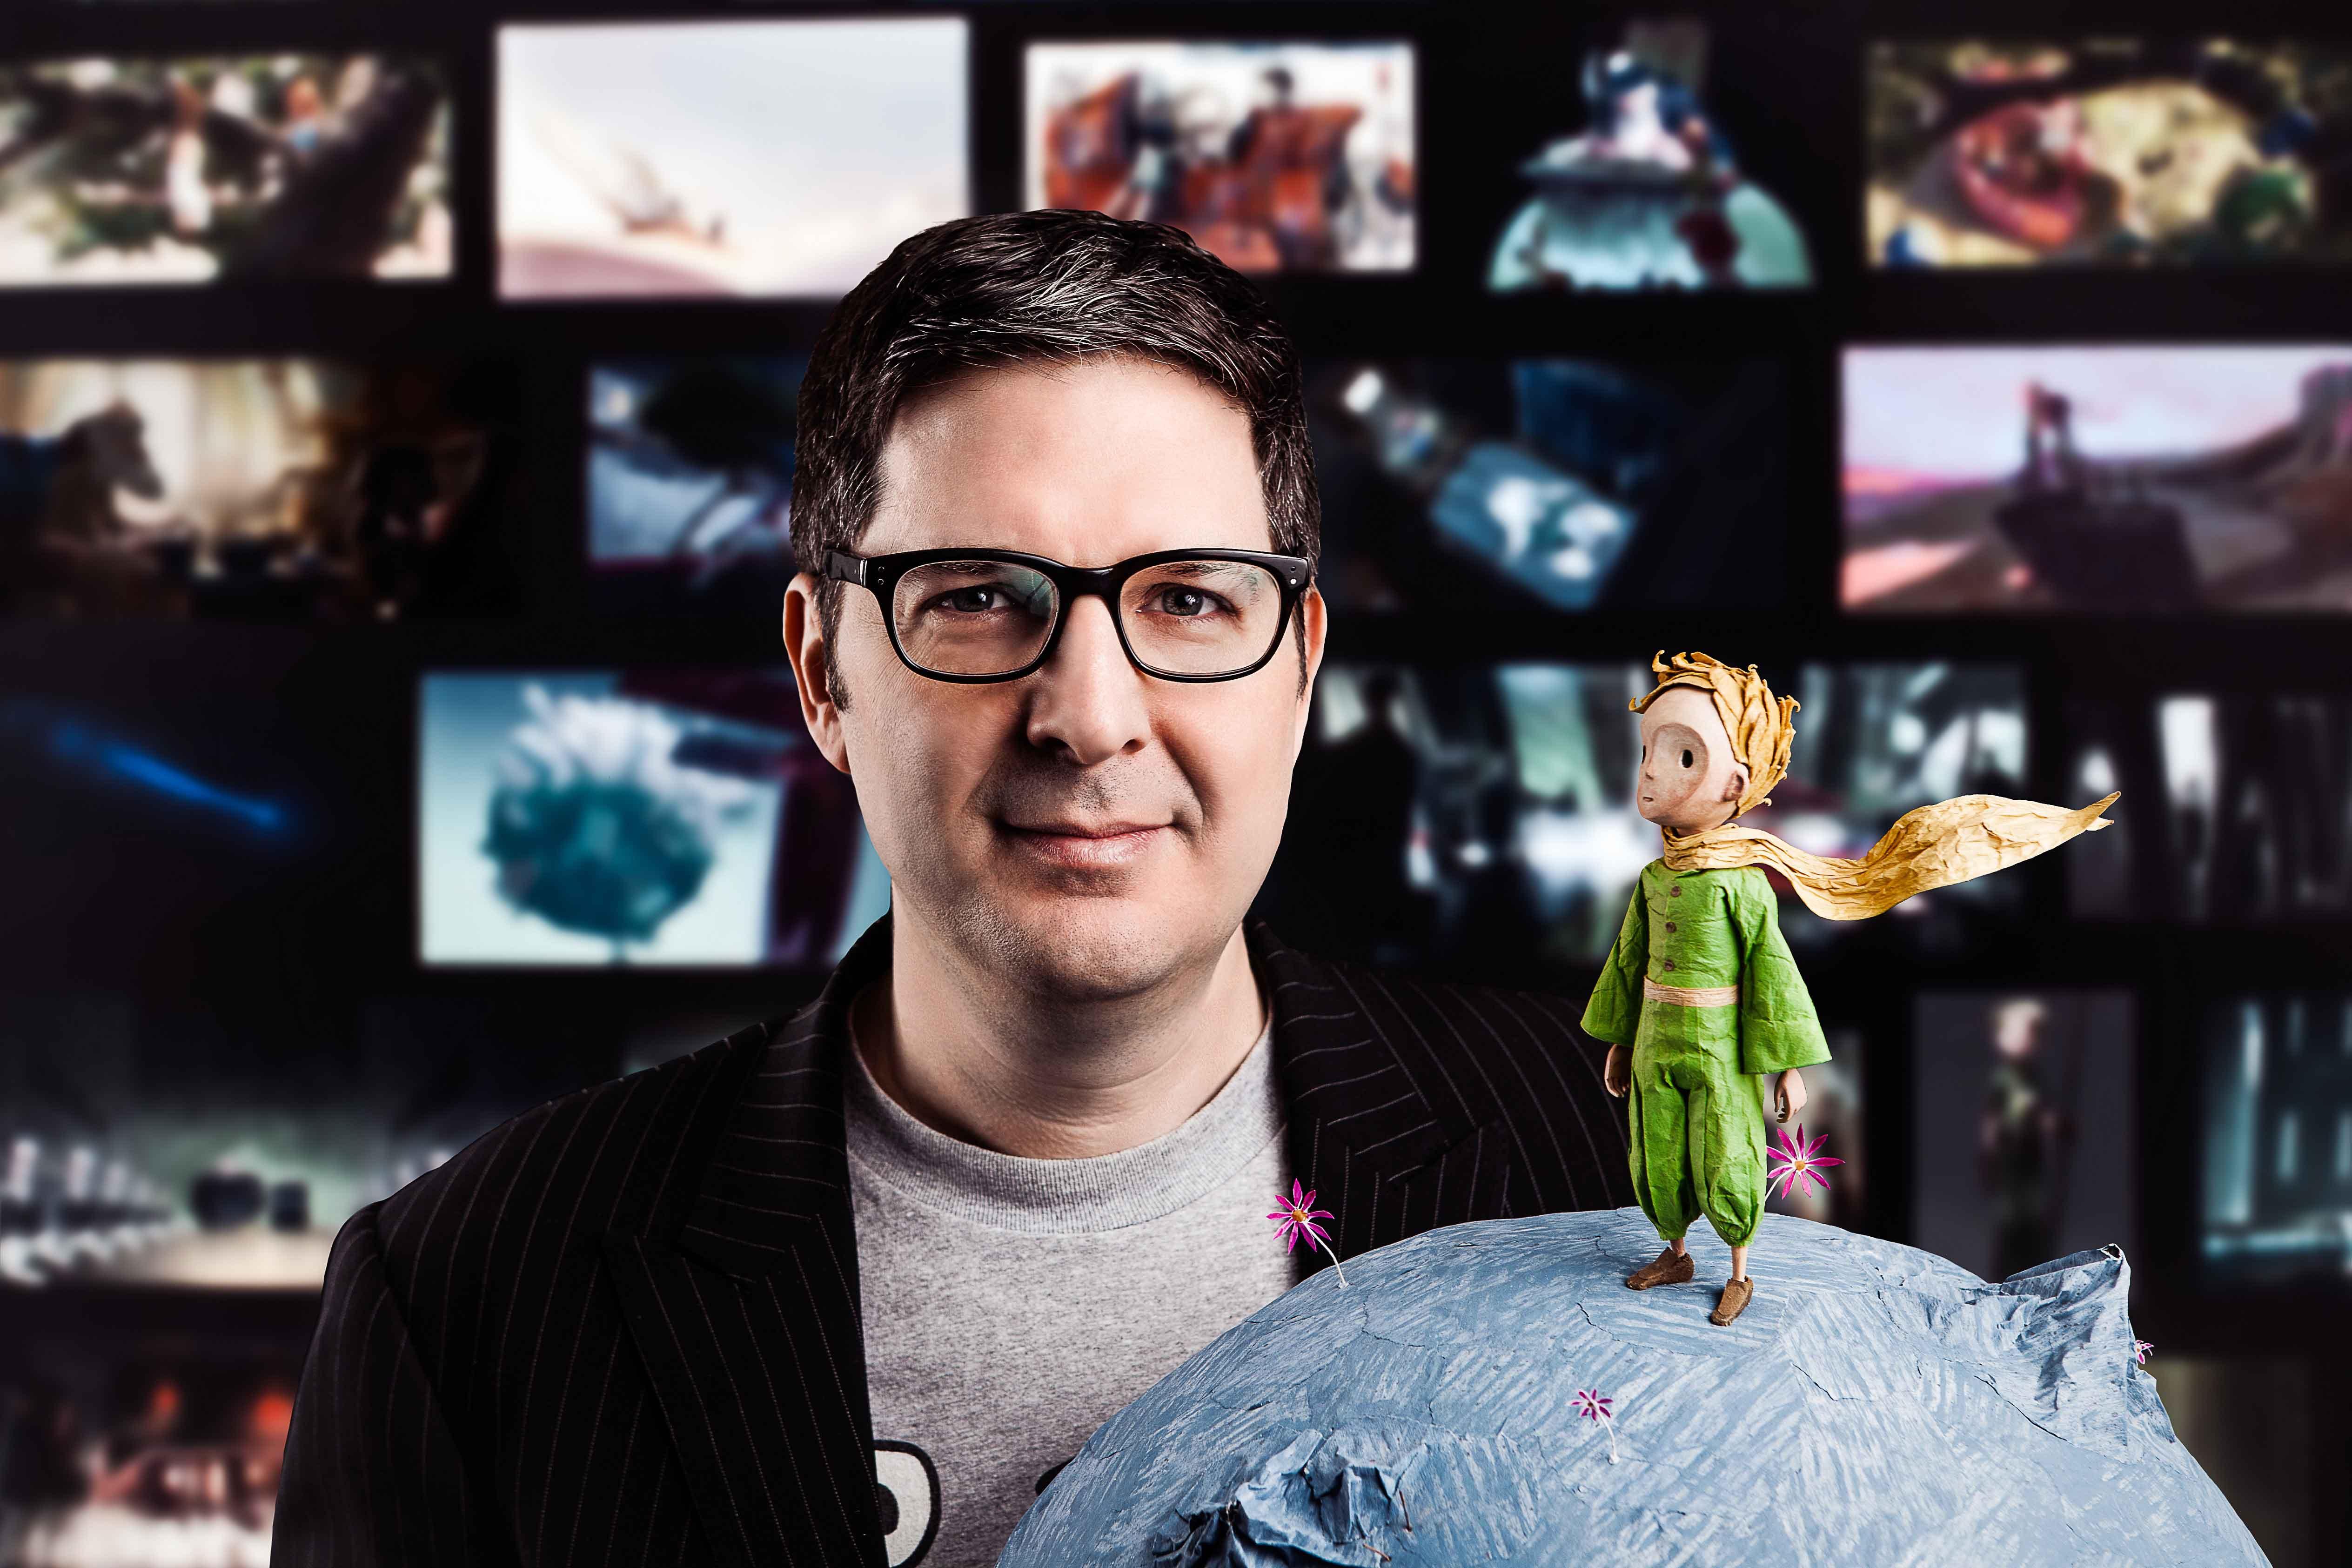 Oscar nominated director Mark Osborne reads 'The Little Prince' for #TimeWellShared